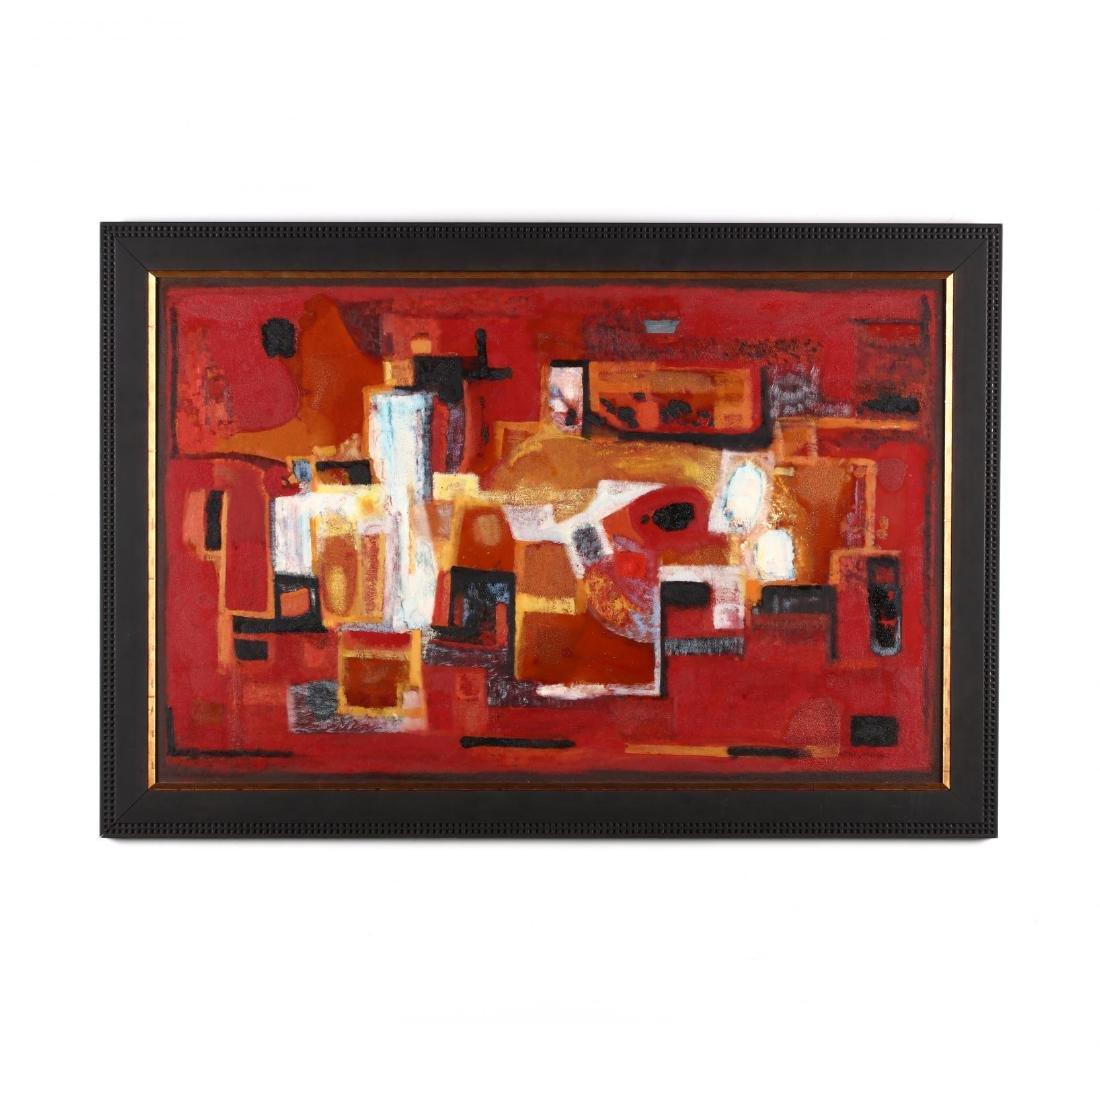 Philip Moose (NC, 1921-2001), Still Life Abstract